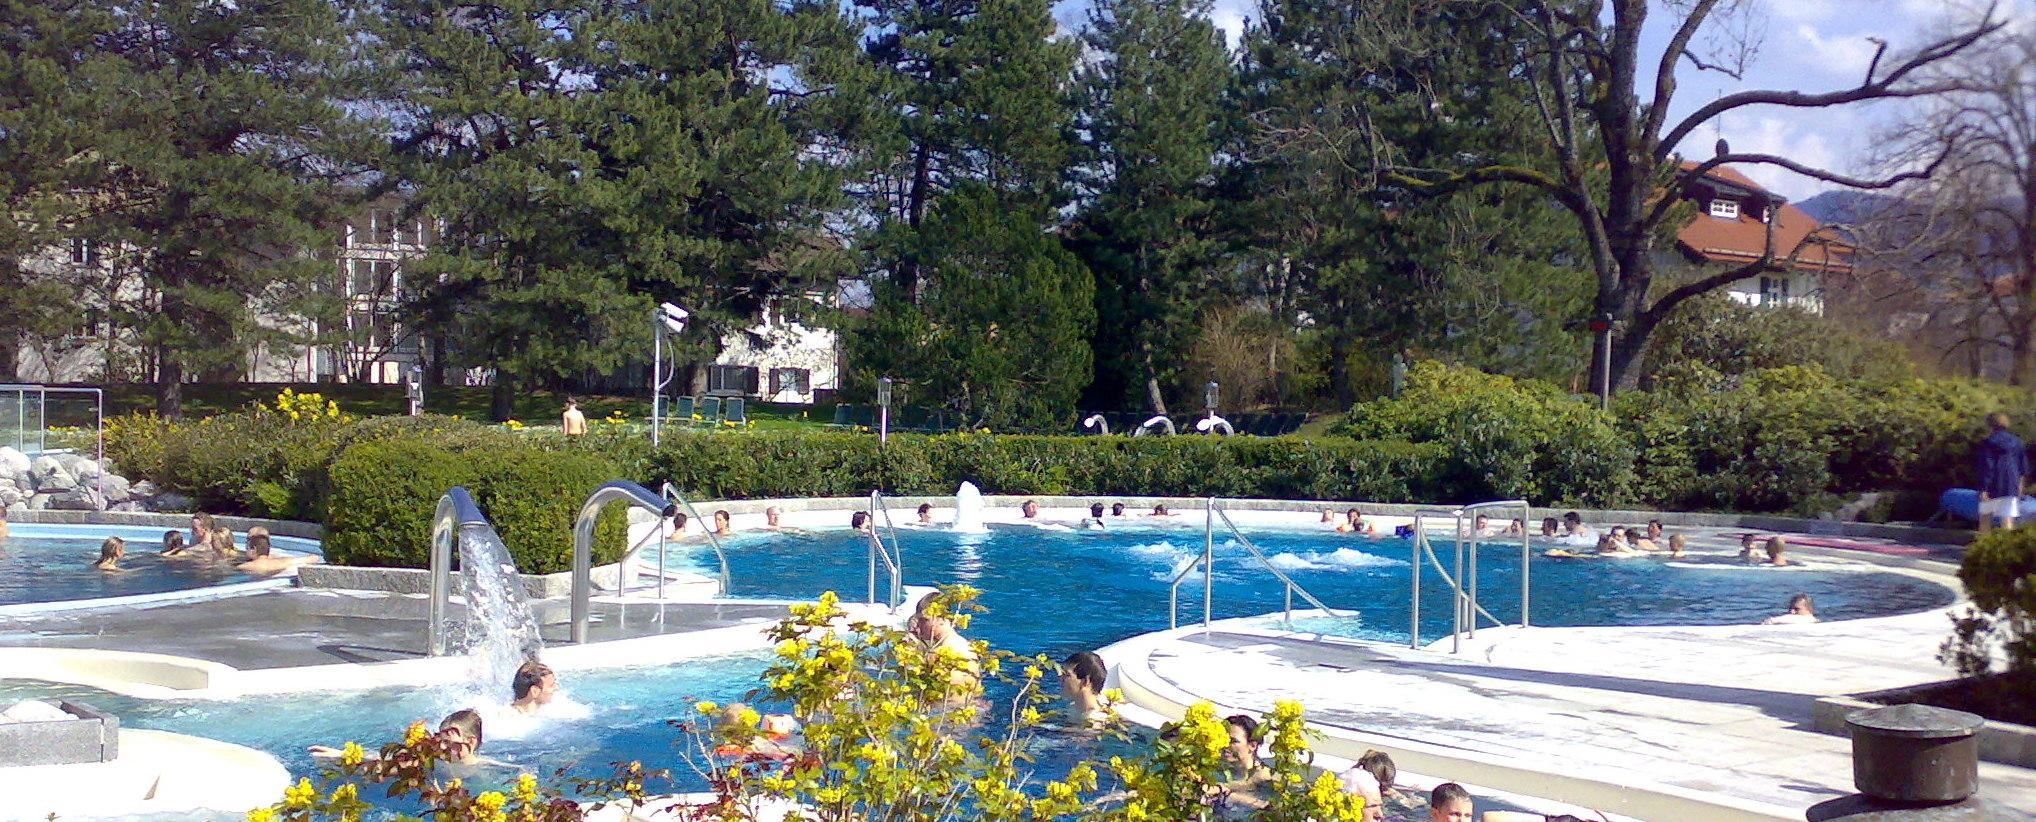 Schwimmbad, Erlebnisbad, Freibad, Hallenbad & Wellness in Oberbayern